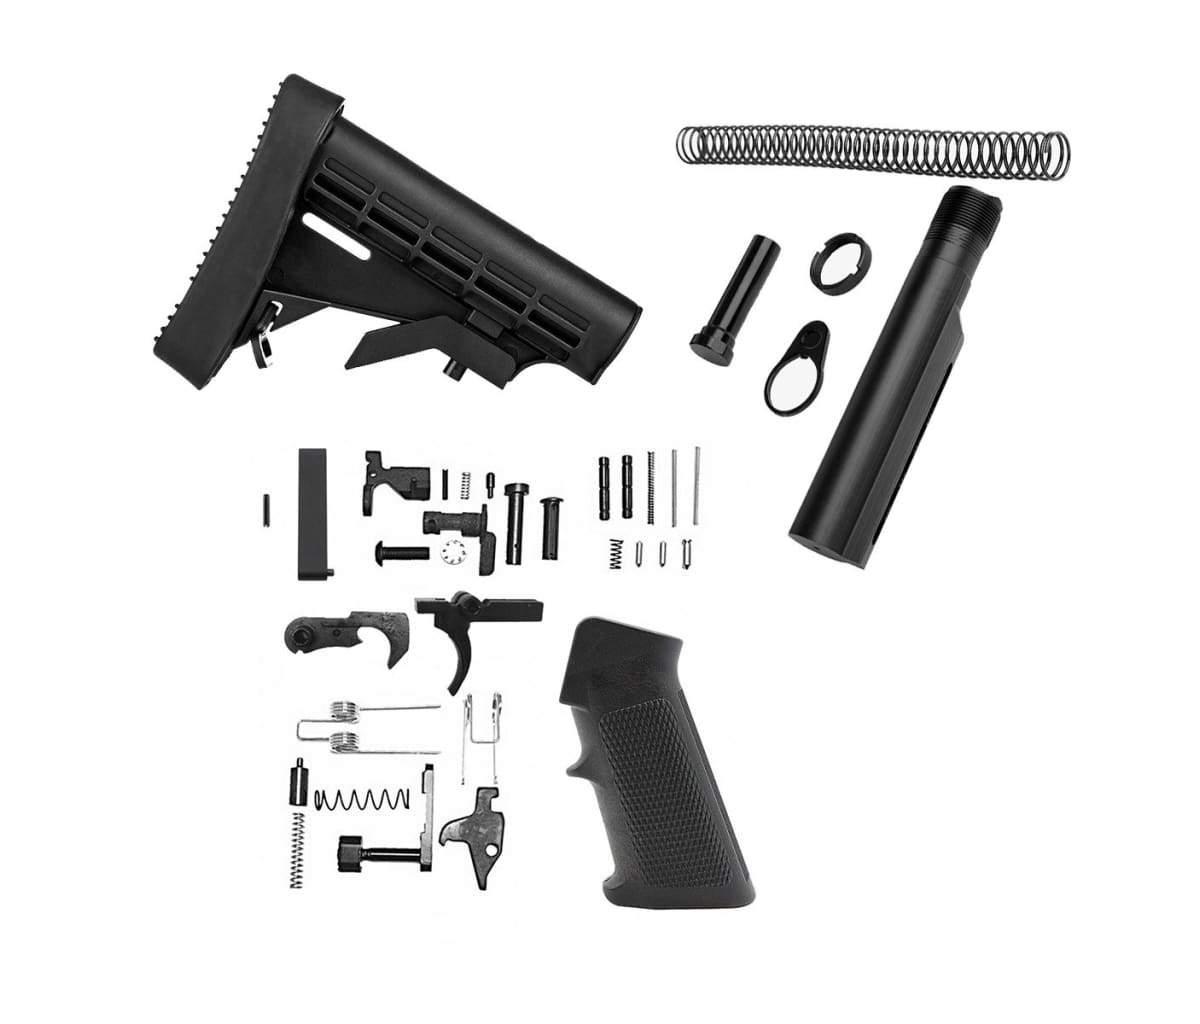 Discount Mil-Spec AR-15 Lower Build Kit